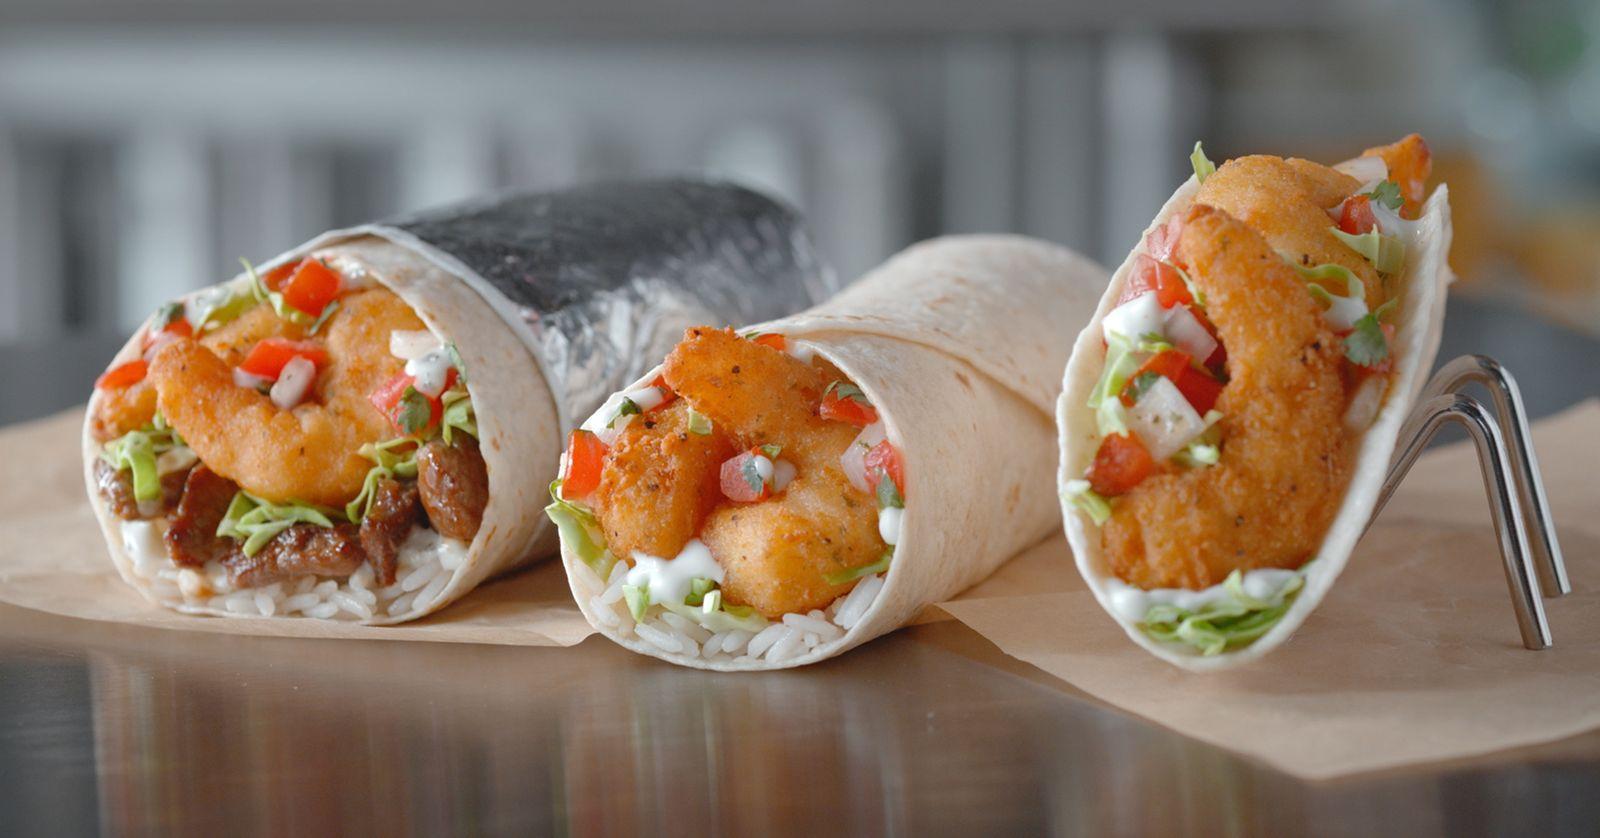 Del Taco Brings Back Seasonal Raving Fan Favorite, Crispy Jumbo Shrimp, for a Limited Time